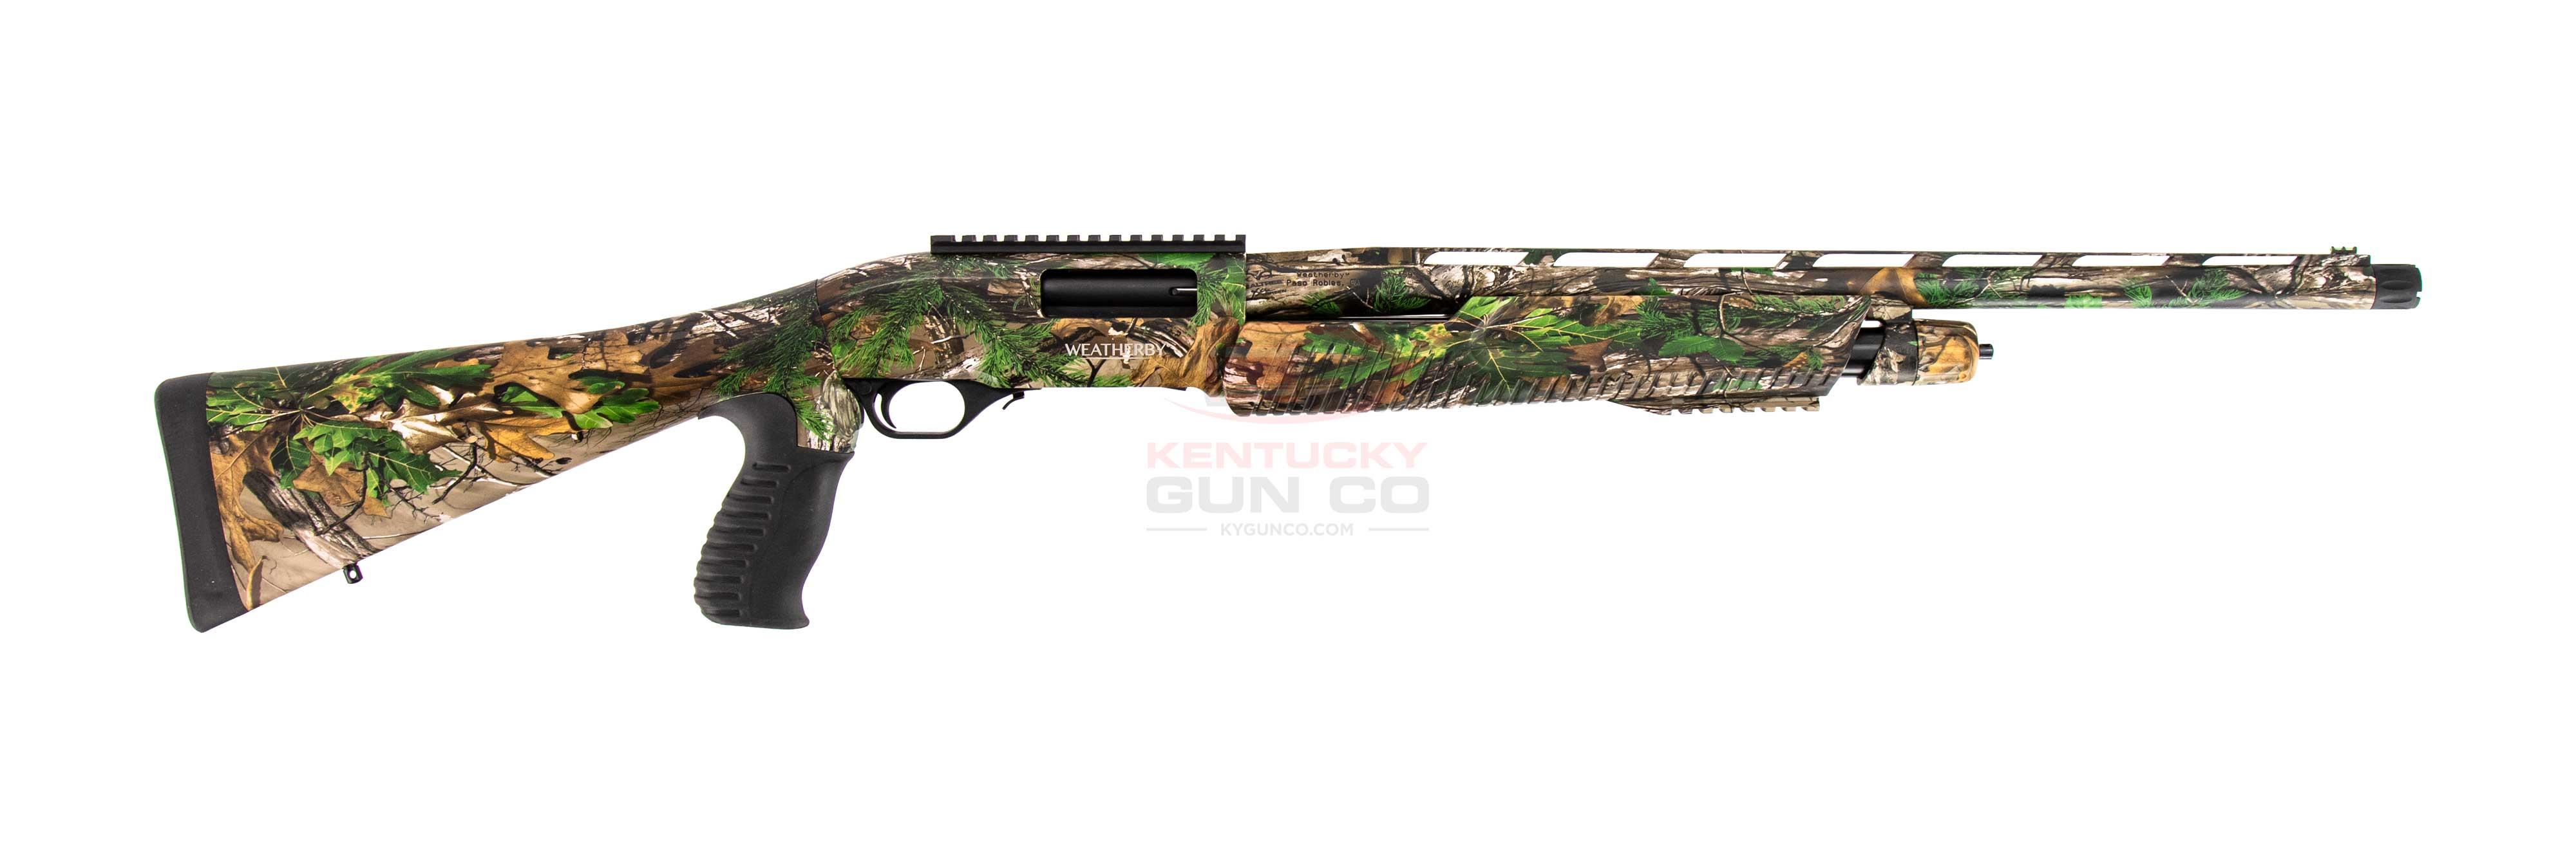 Weatherby PA-459 Turkey 12GA Realtree Xtra Green - $238 18 (Free S/H on  Firearms)